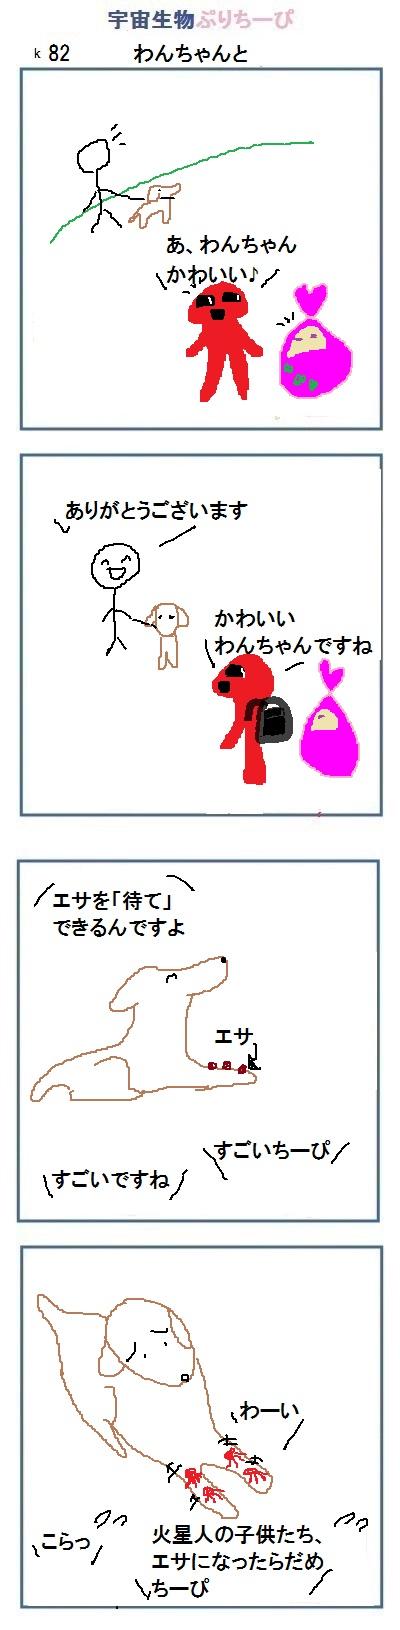 160826_k82.jpg